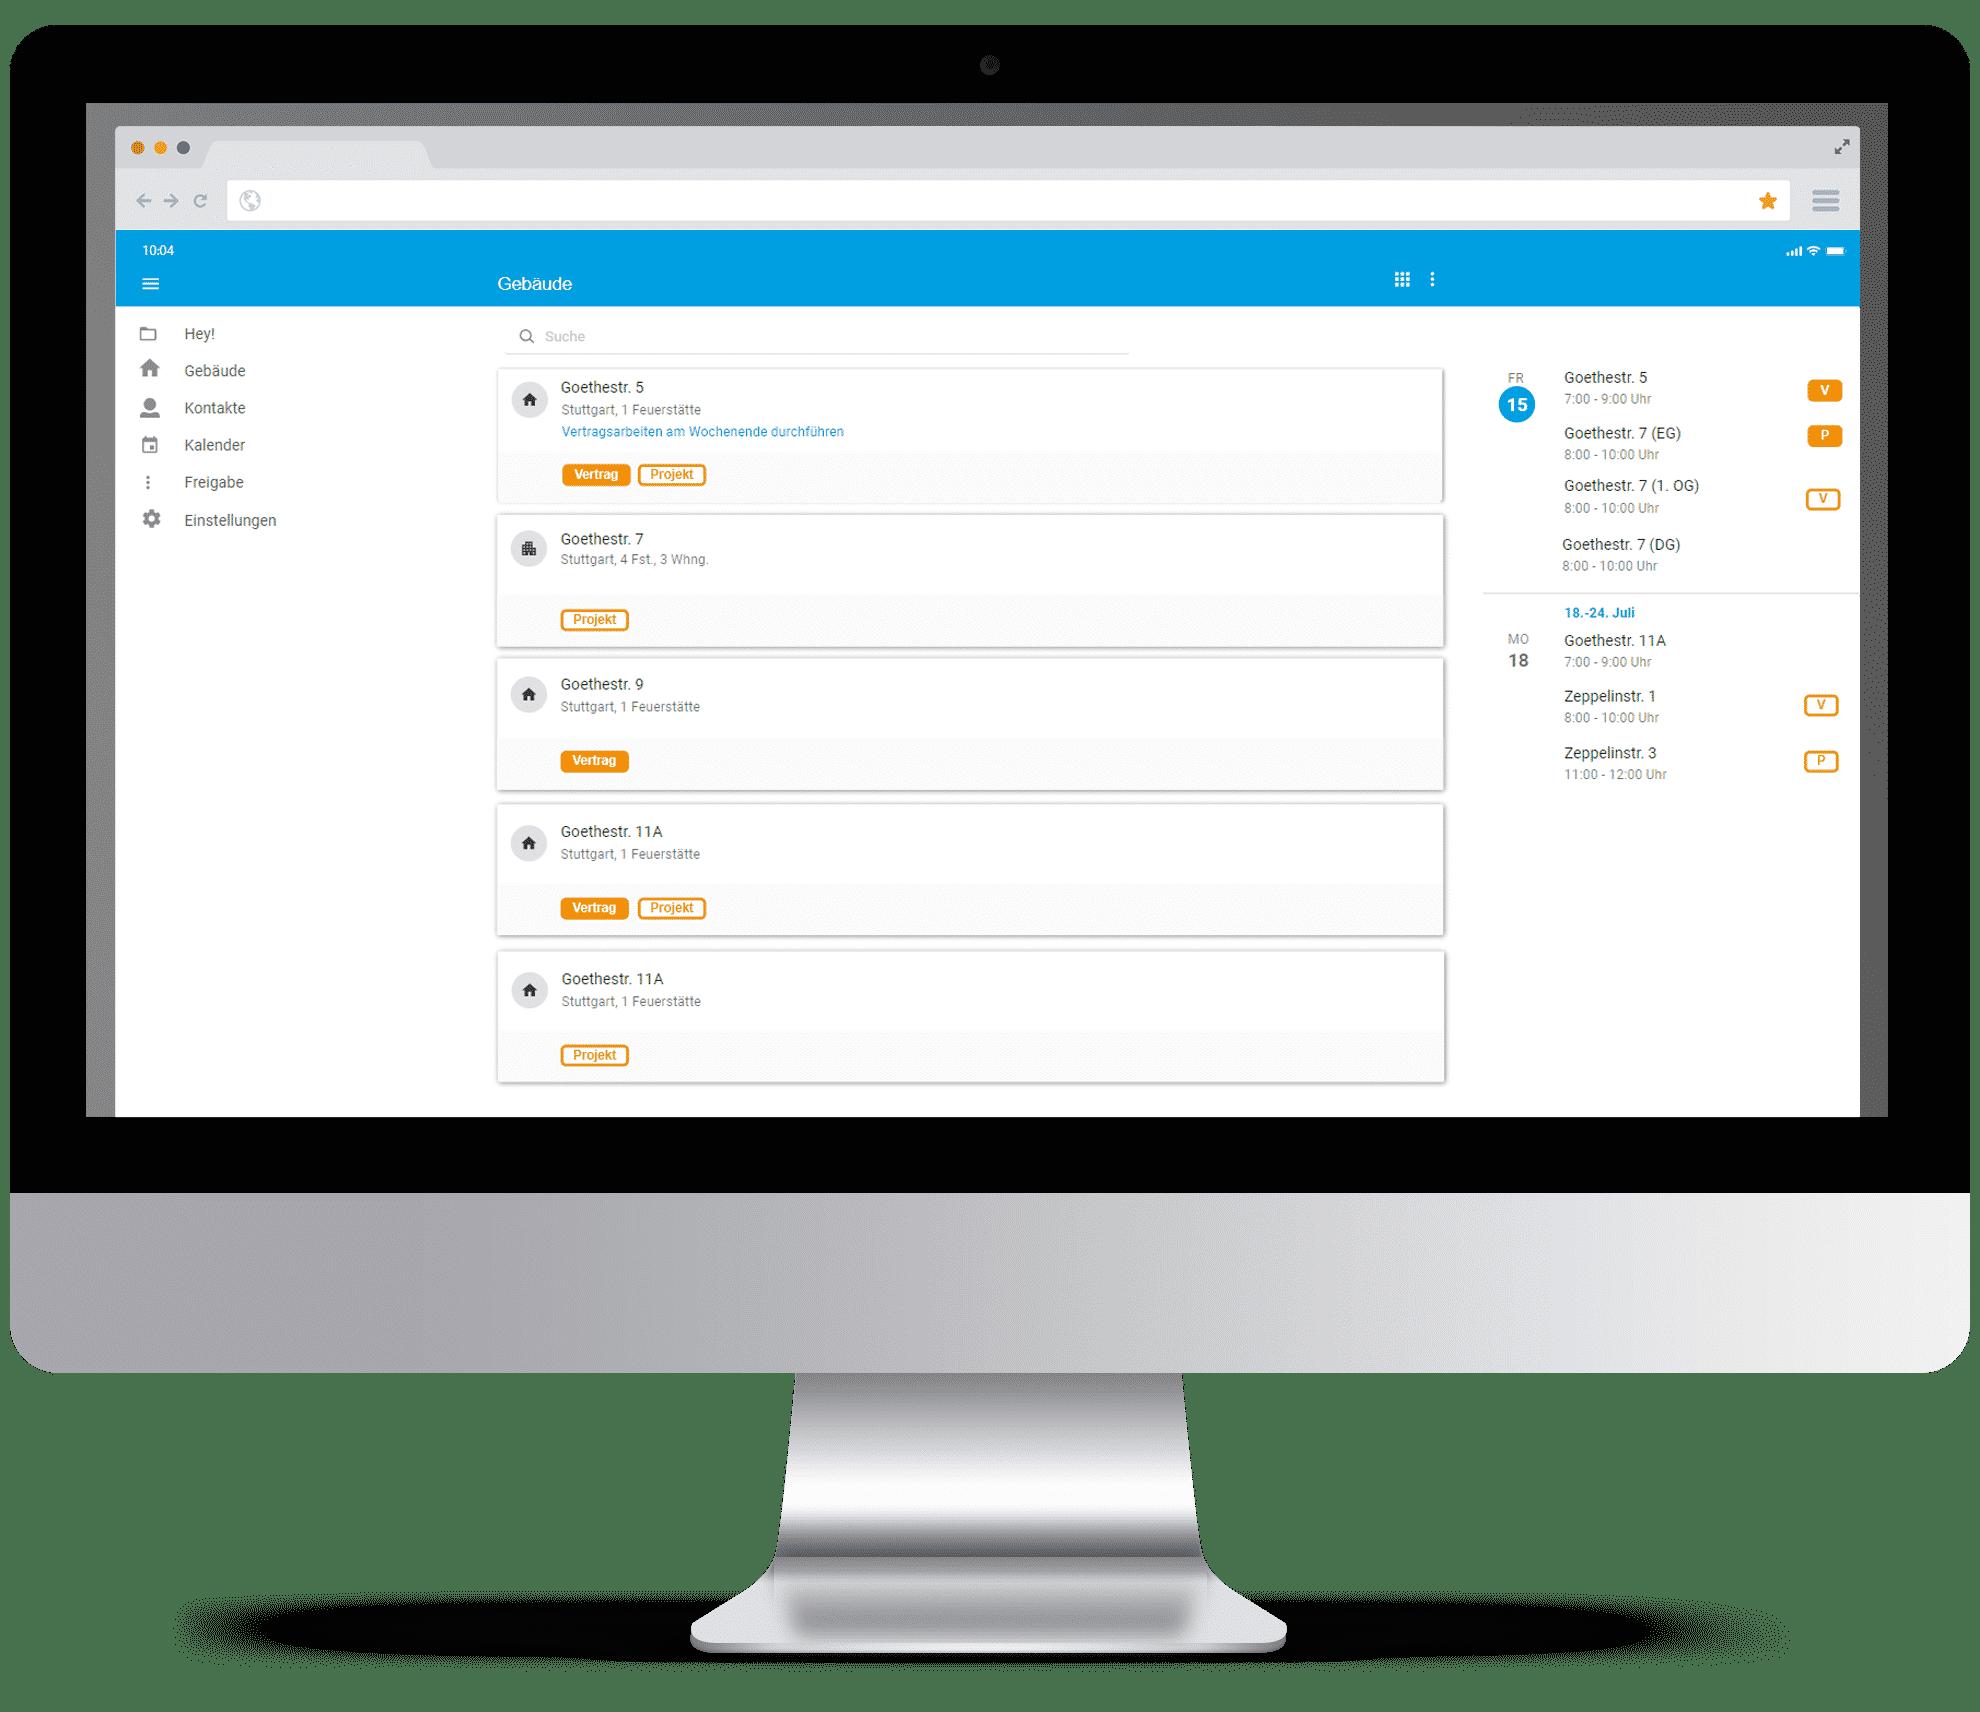 Screenshot digibase - Rechnungsprogramm & CRM